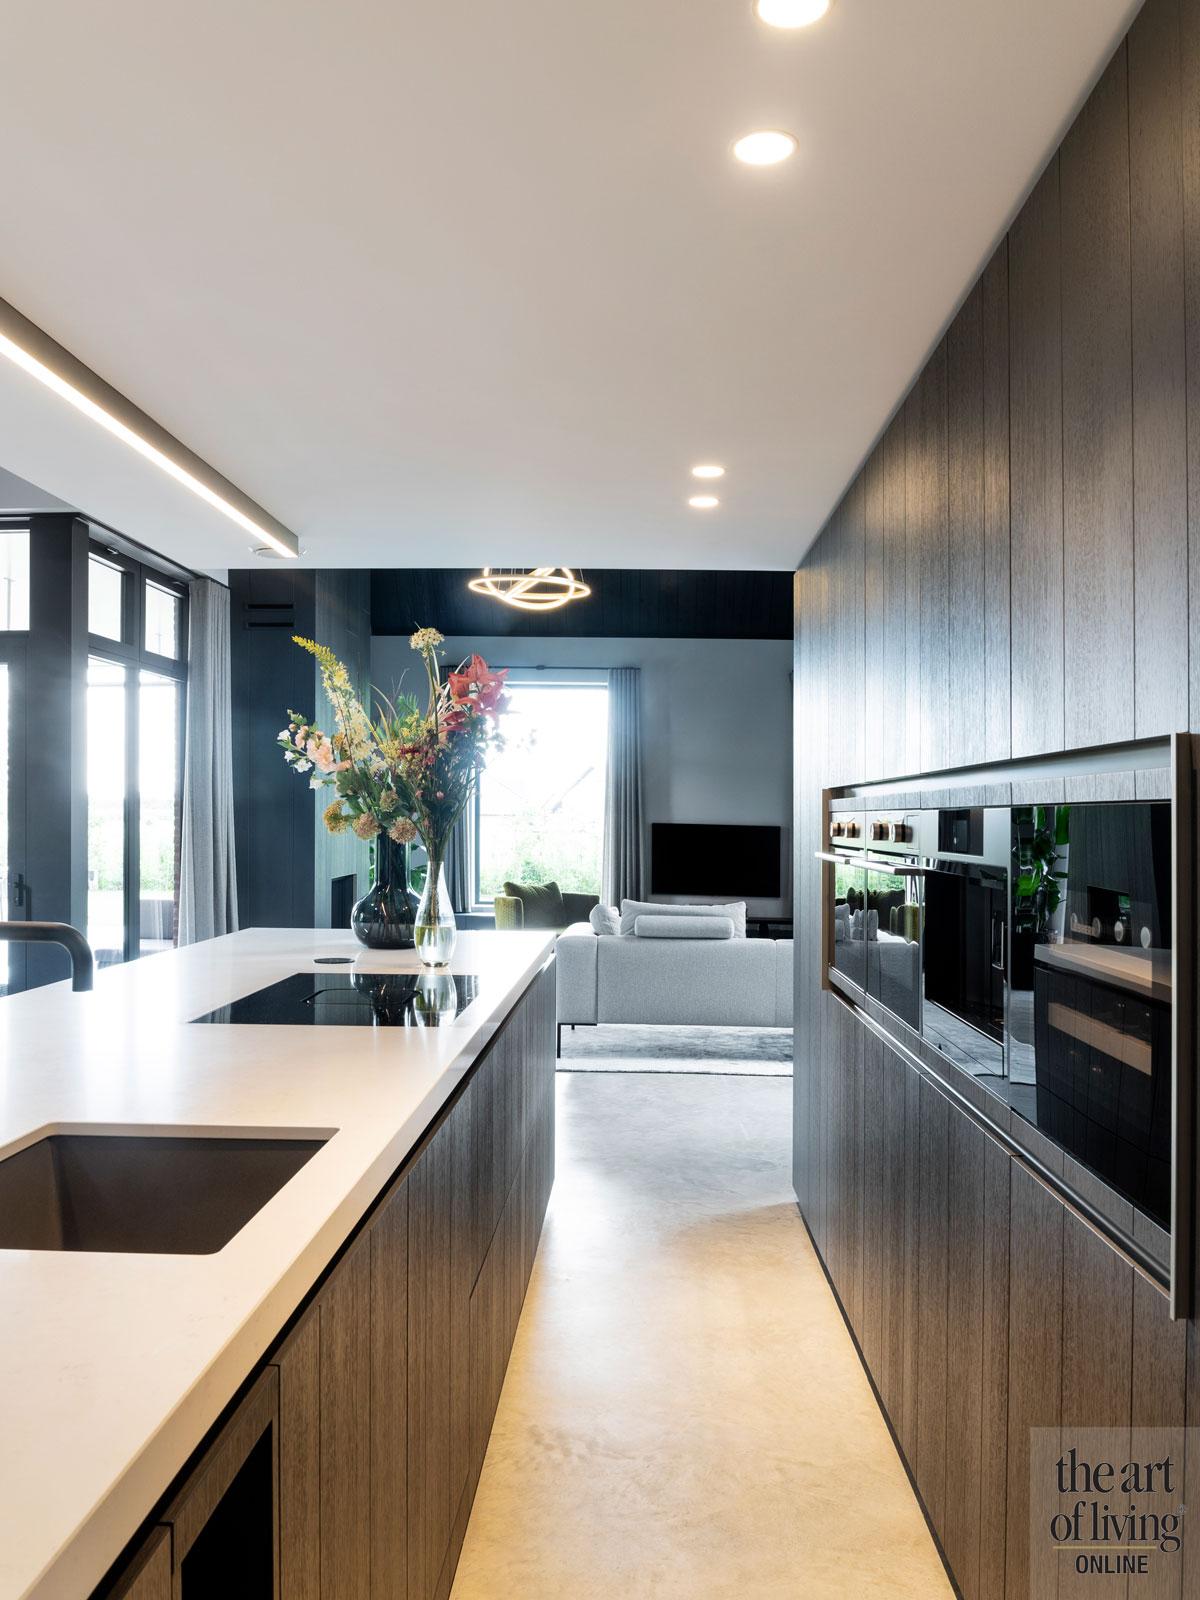 Donkere keuken | Arend Groenewegen woning -Ulicoten, the art of living